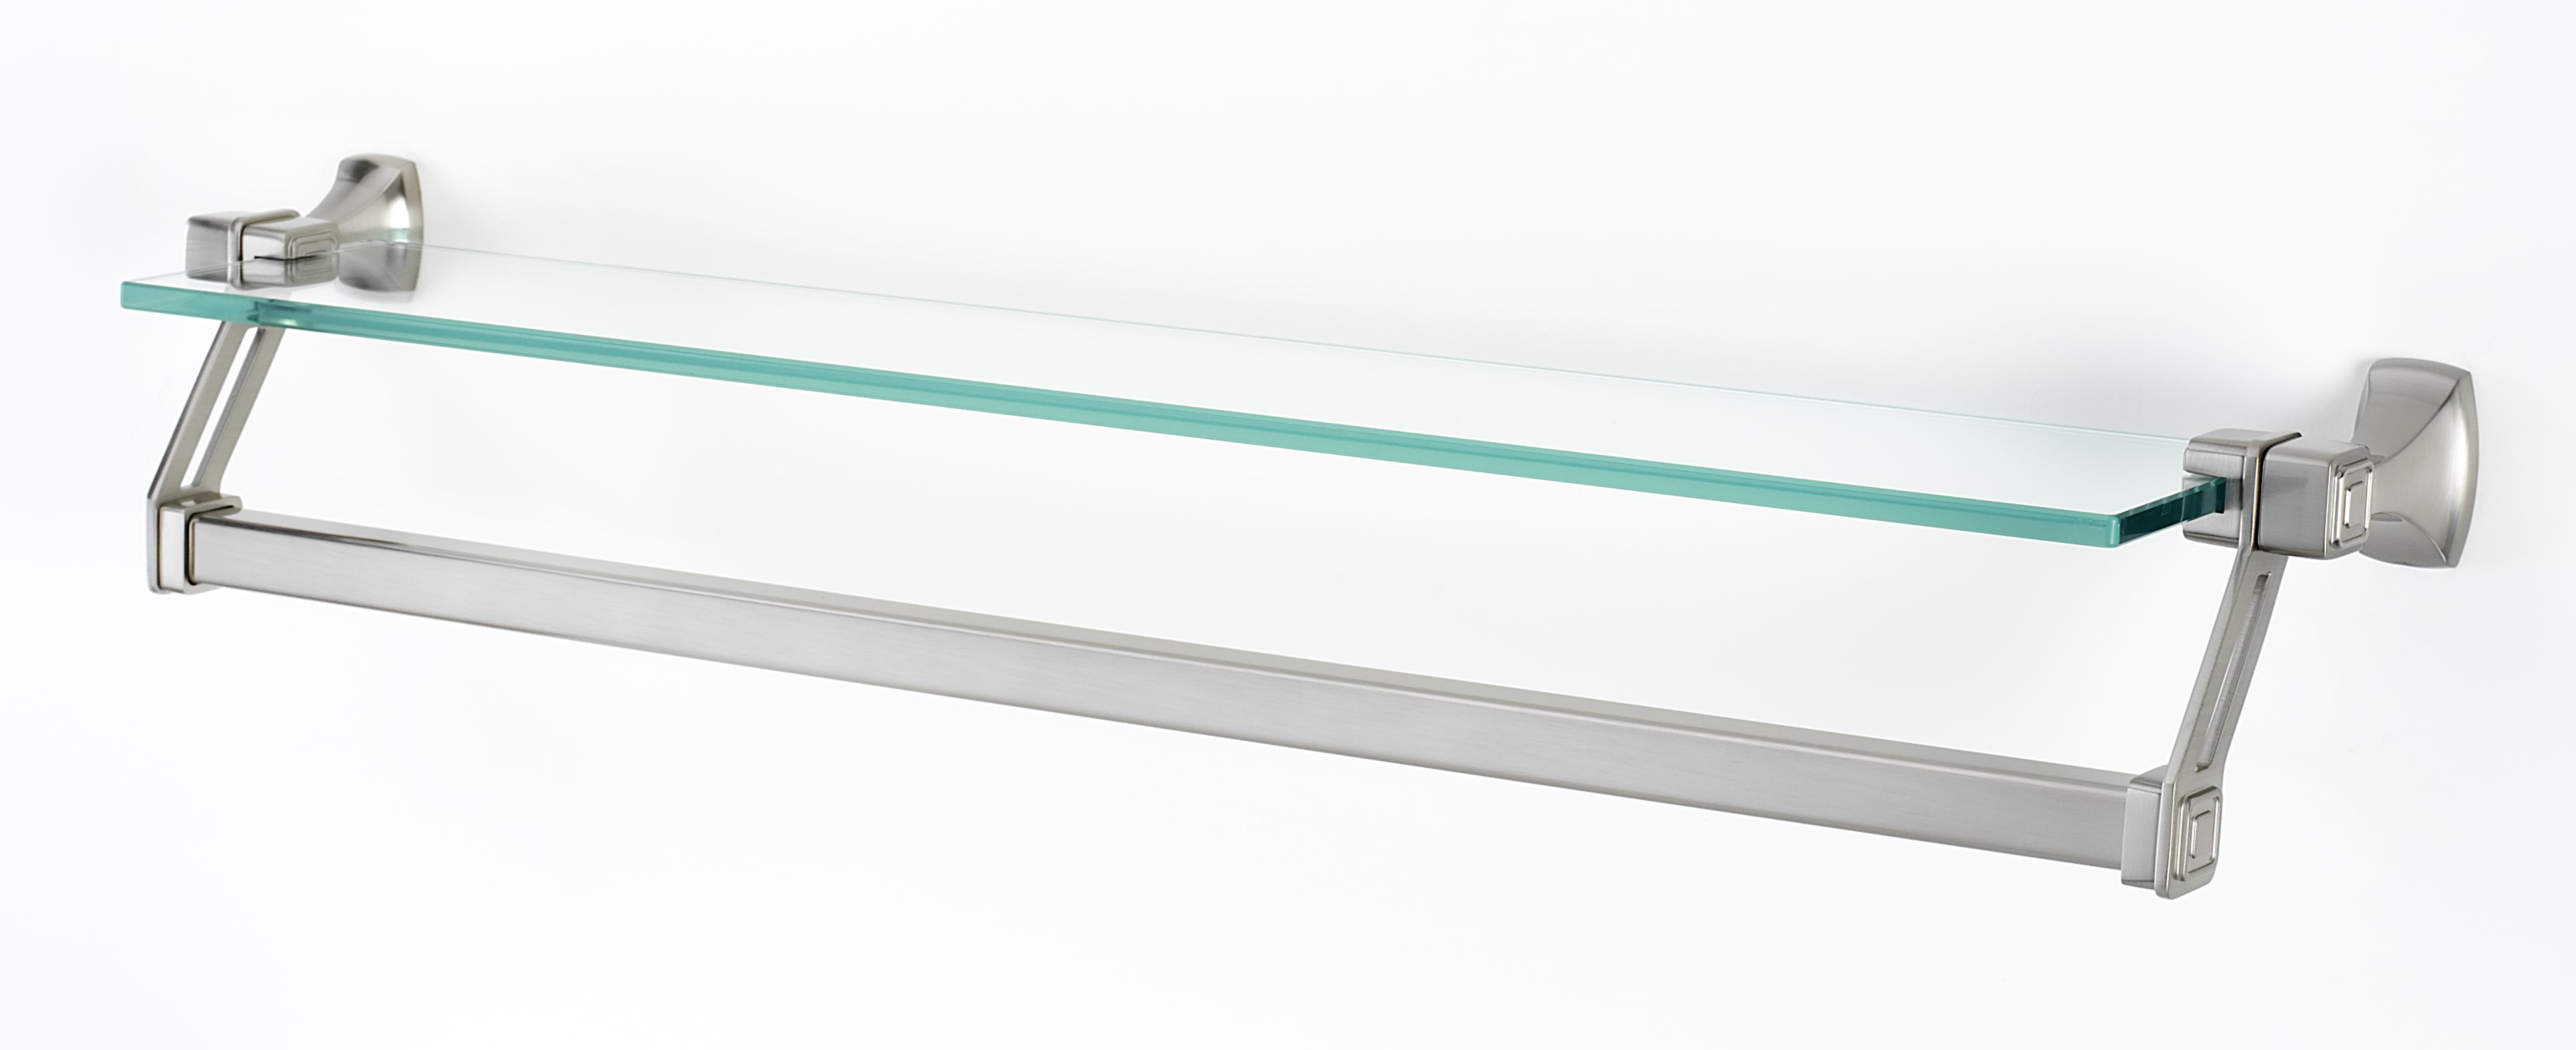 Cube Gl Shelf With Towel Bar A6527 25